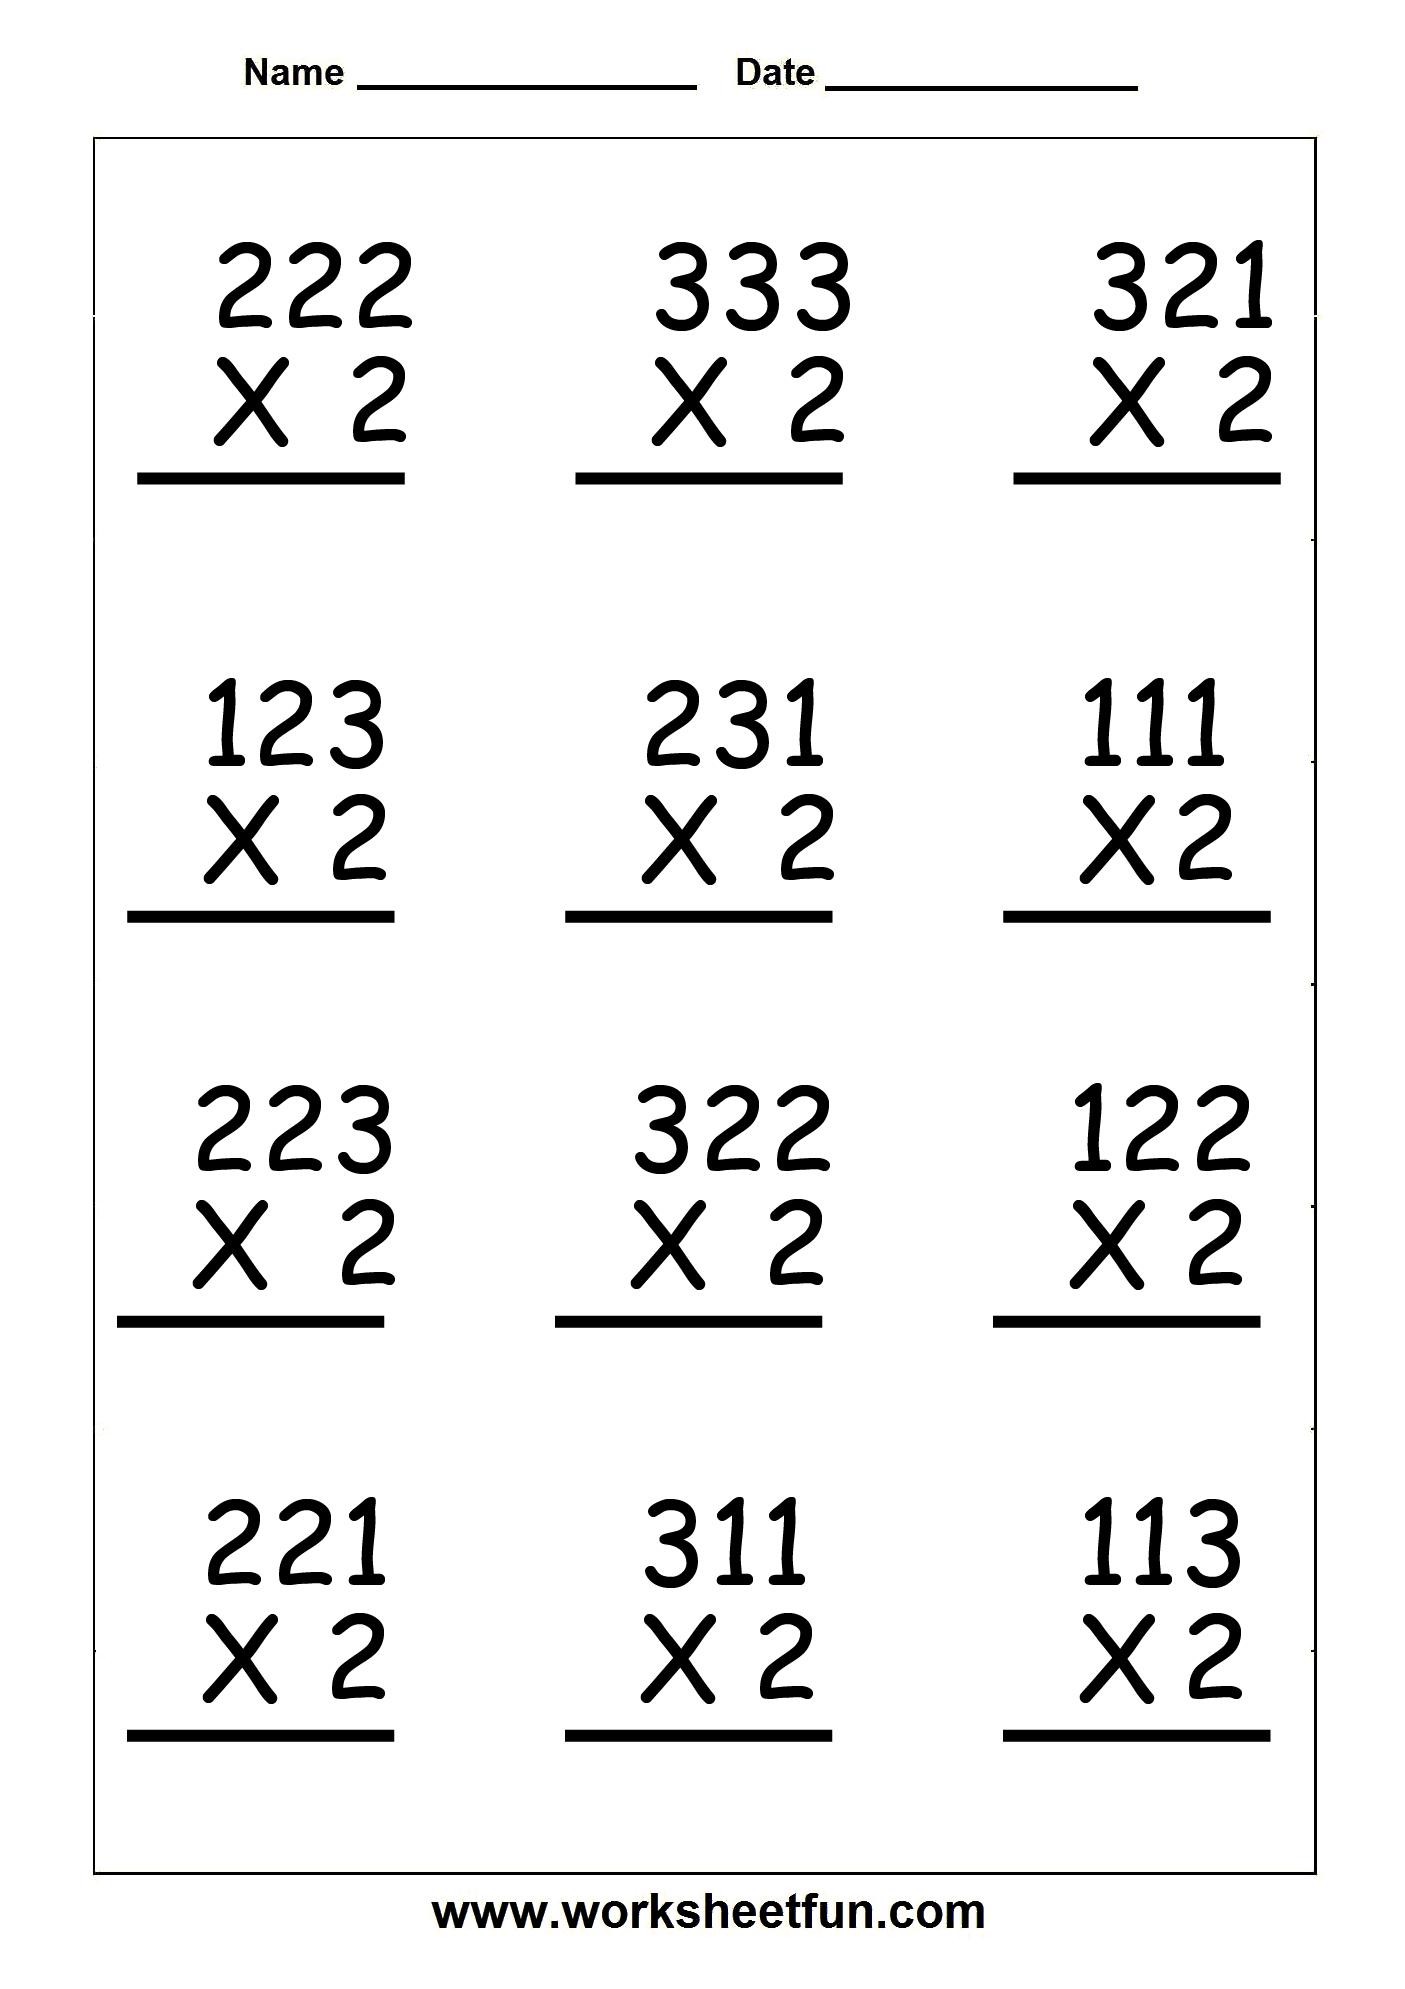 Copy Of Single Digit Multiplication Worksheets - Lessons for Multiplication Worksheets Double Digit